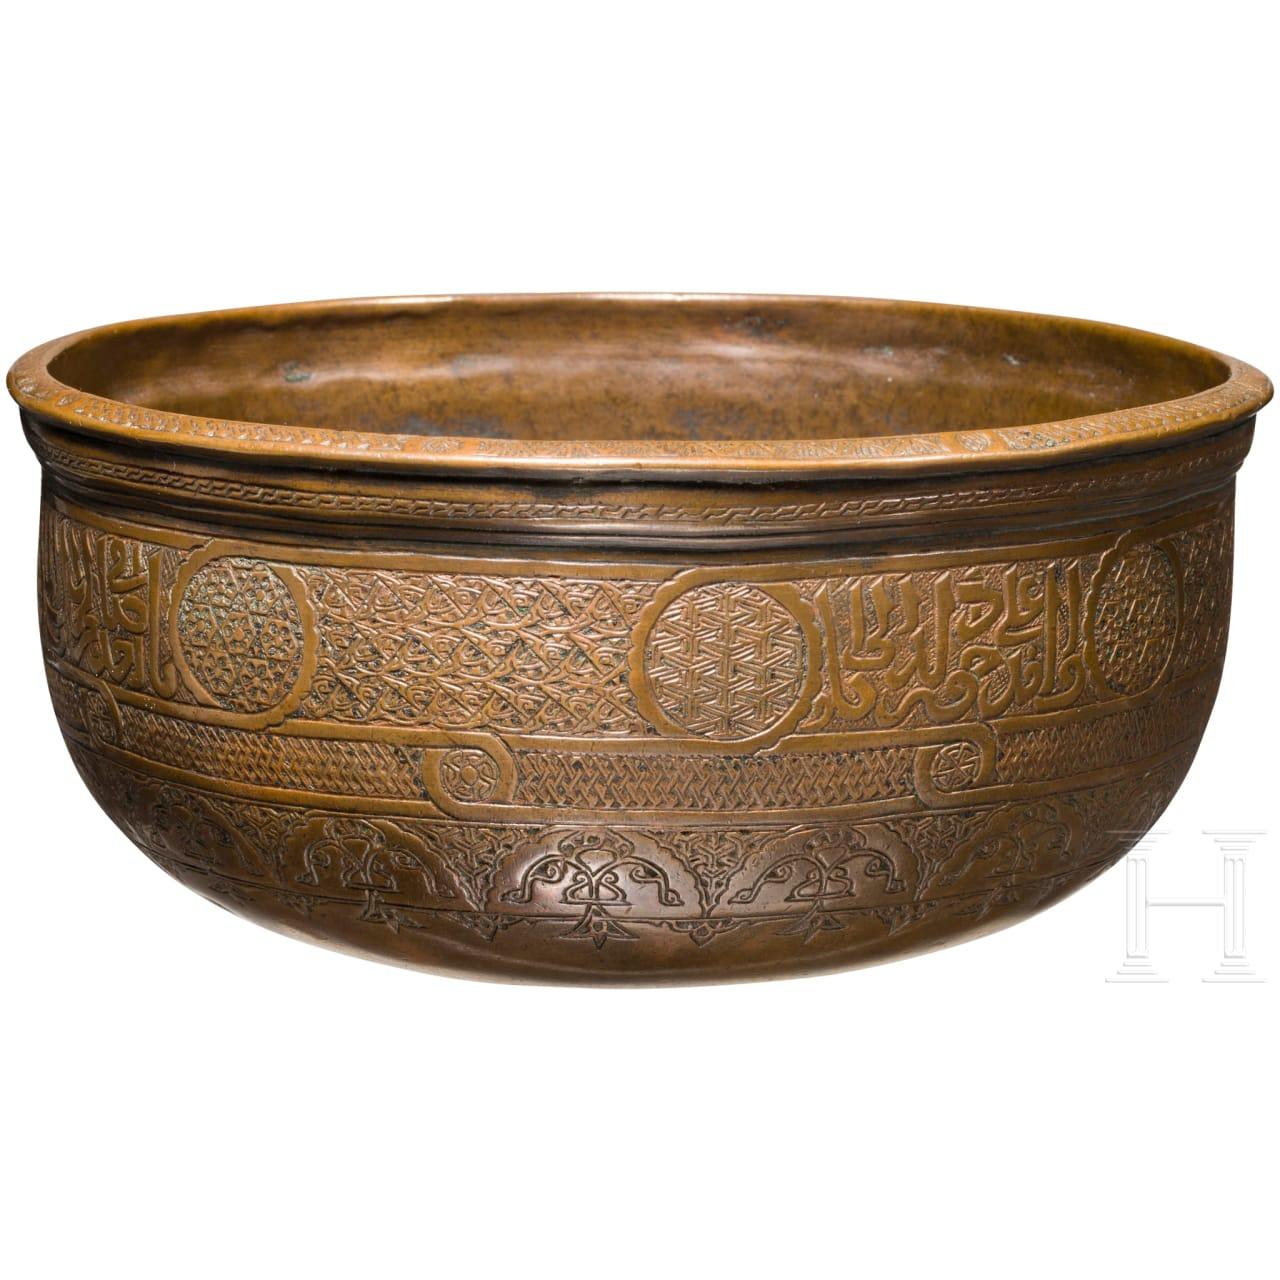 Engraved copper bowl, Mamluk style, 16th century